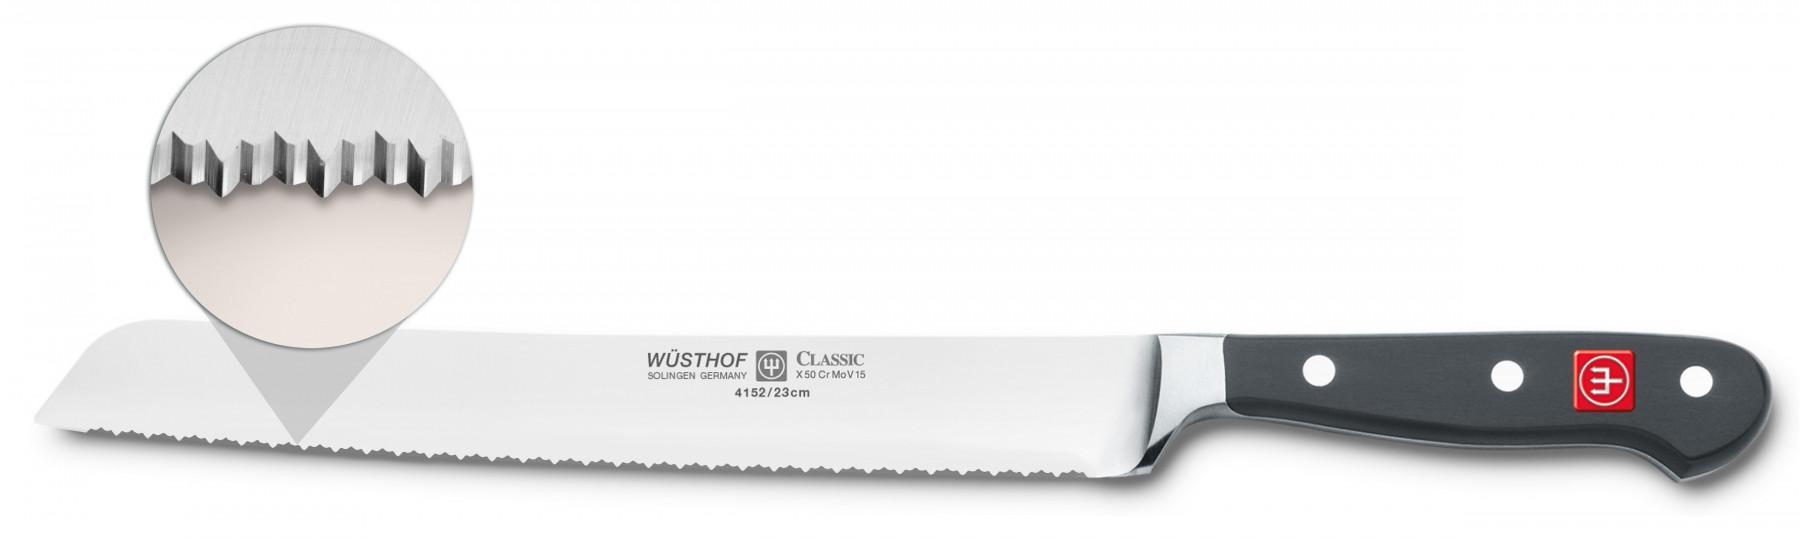 Wüsthof Dreizack Classic Brotmesser Präzisions-Doppelwelle